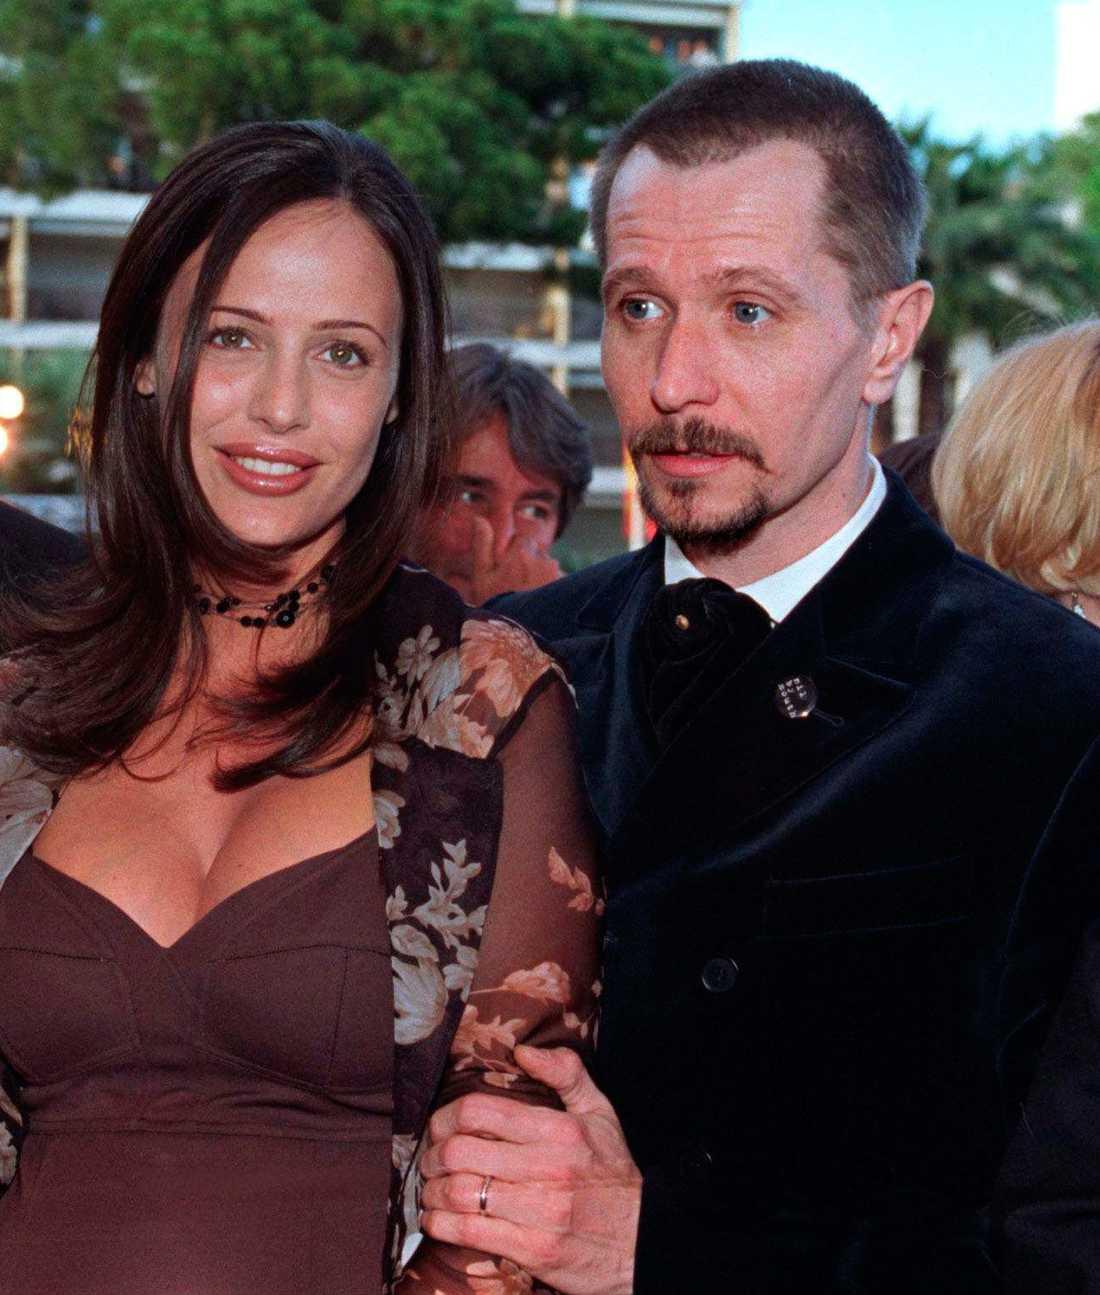 Donya Fiorentino och Gary Oldman under filmfestivalen i Cannes 1997.